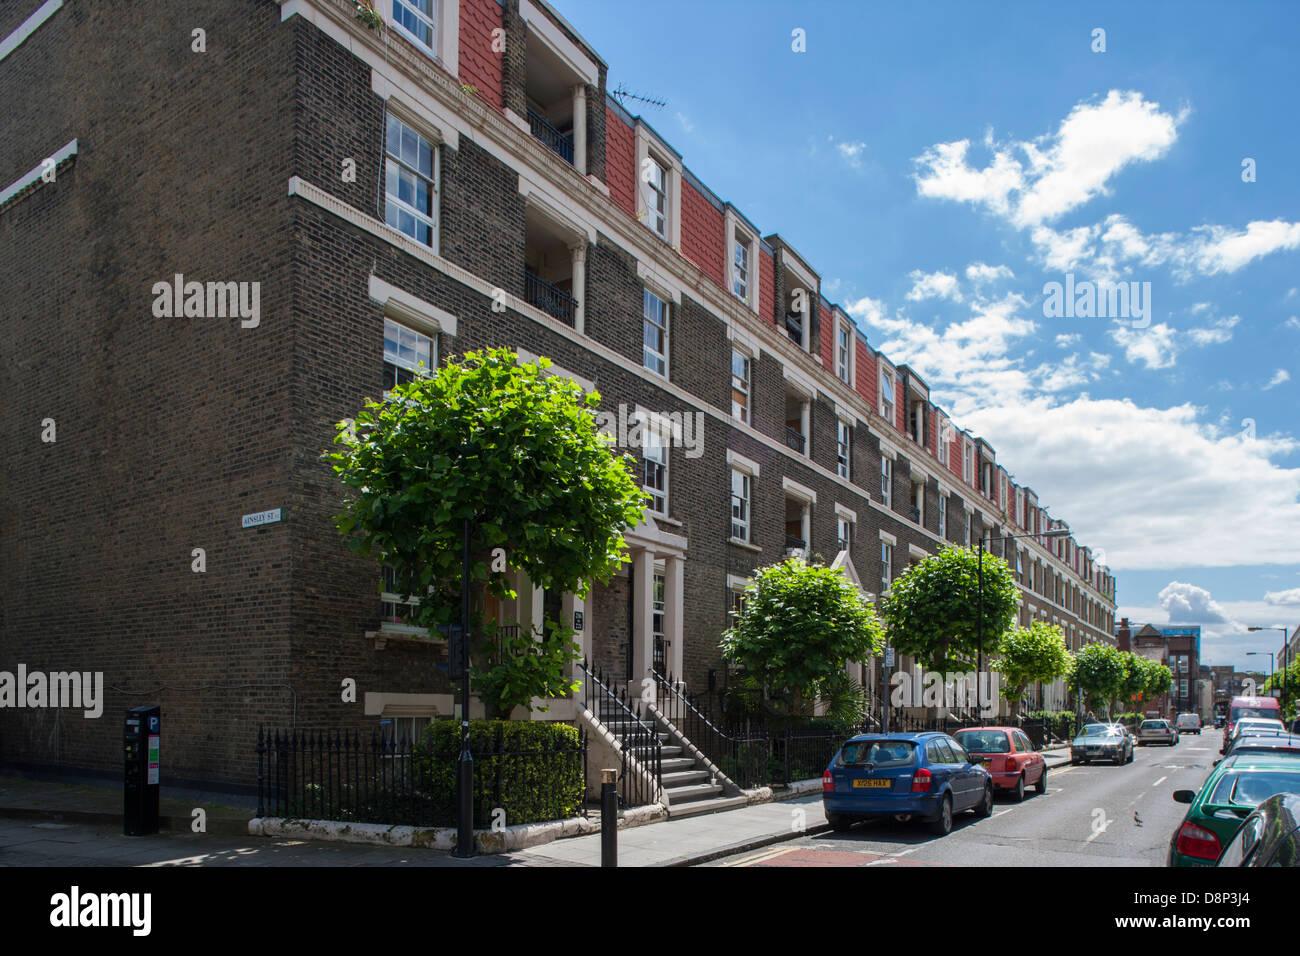 Wilmot Street Bethnal Green London - Stock Image